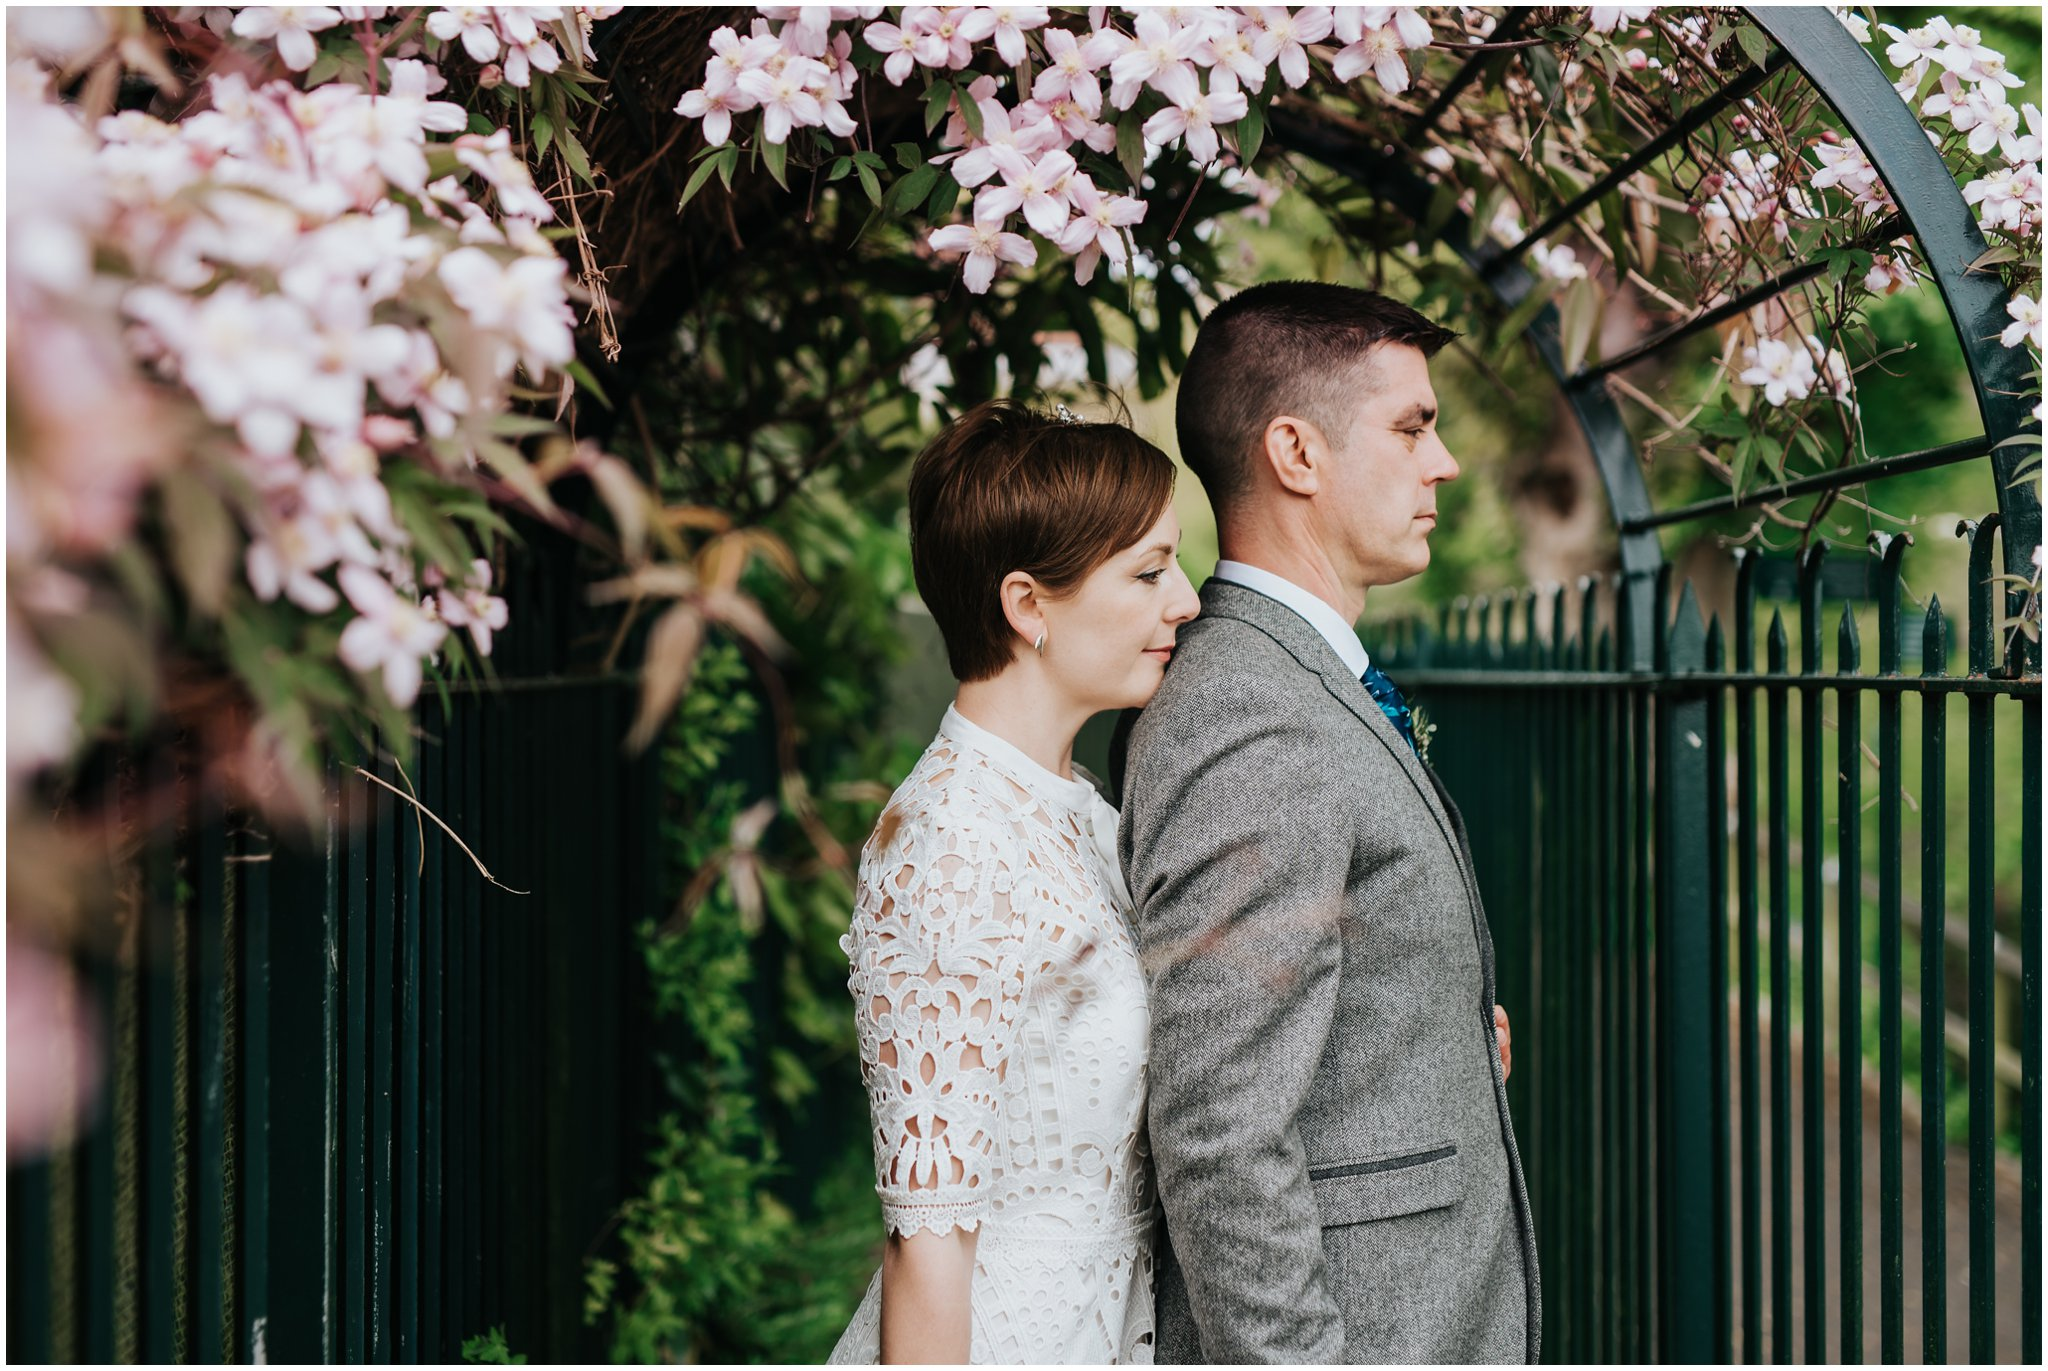 Wedding photographer Winchester